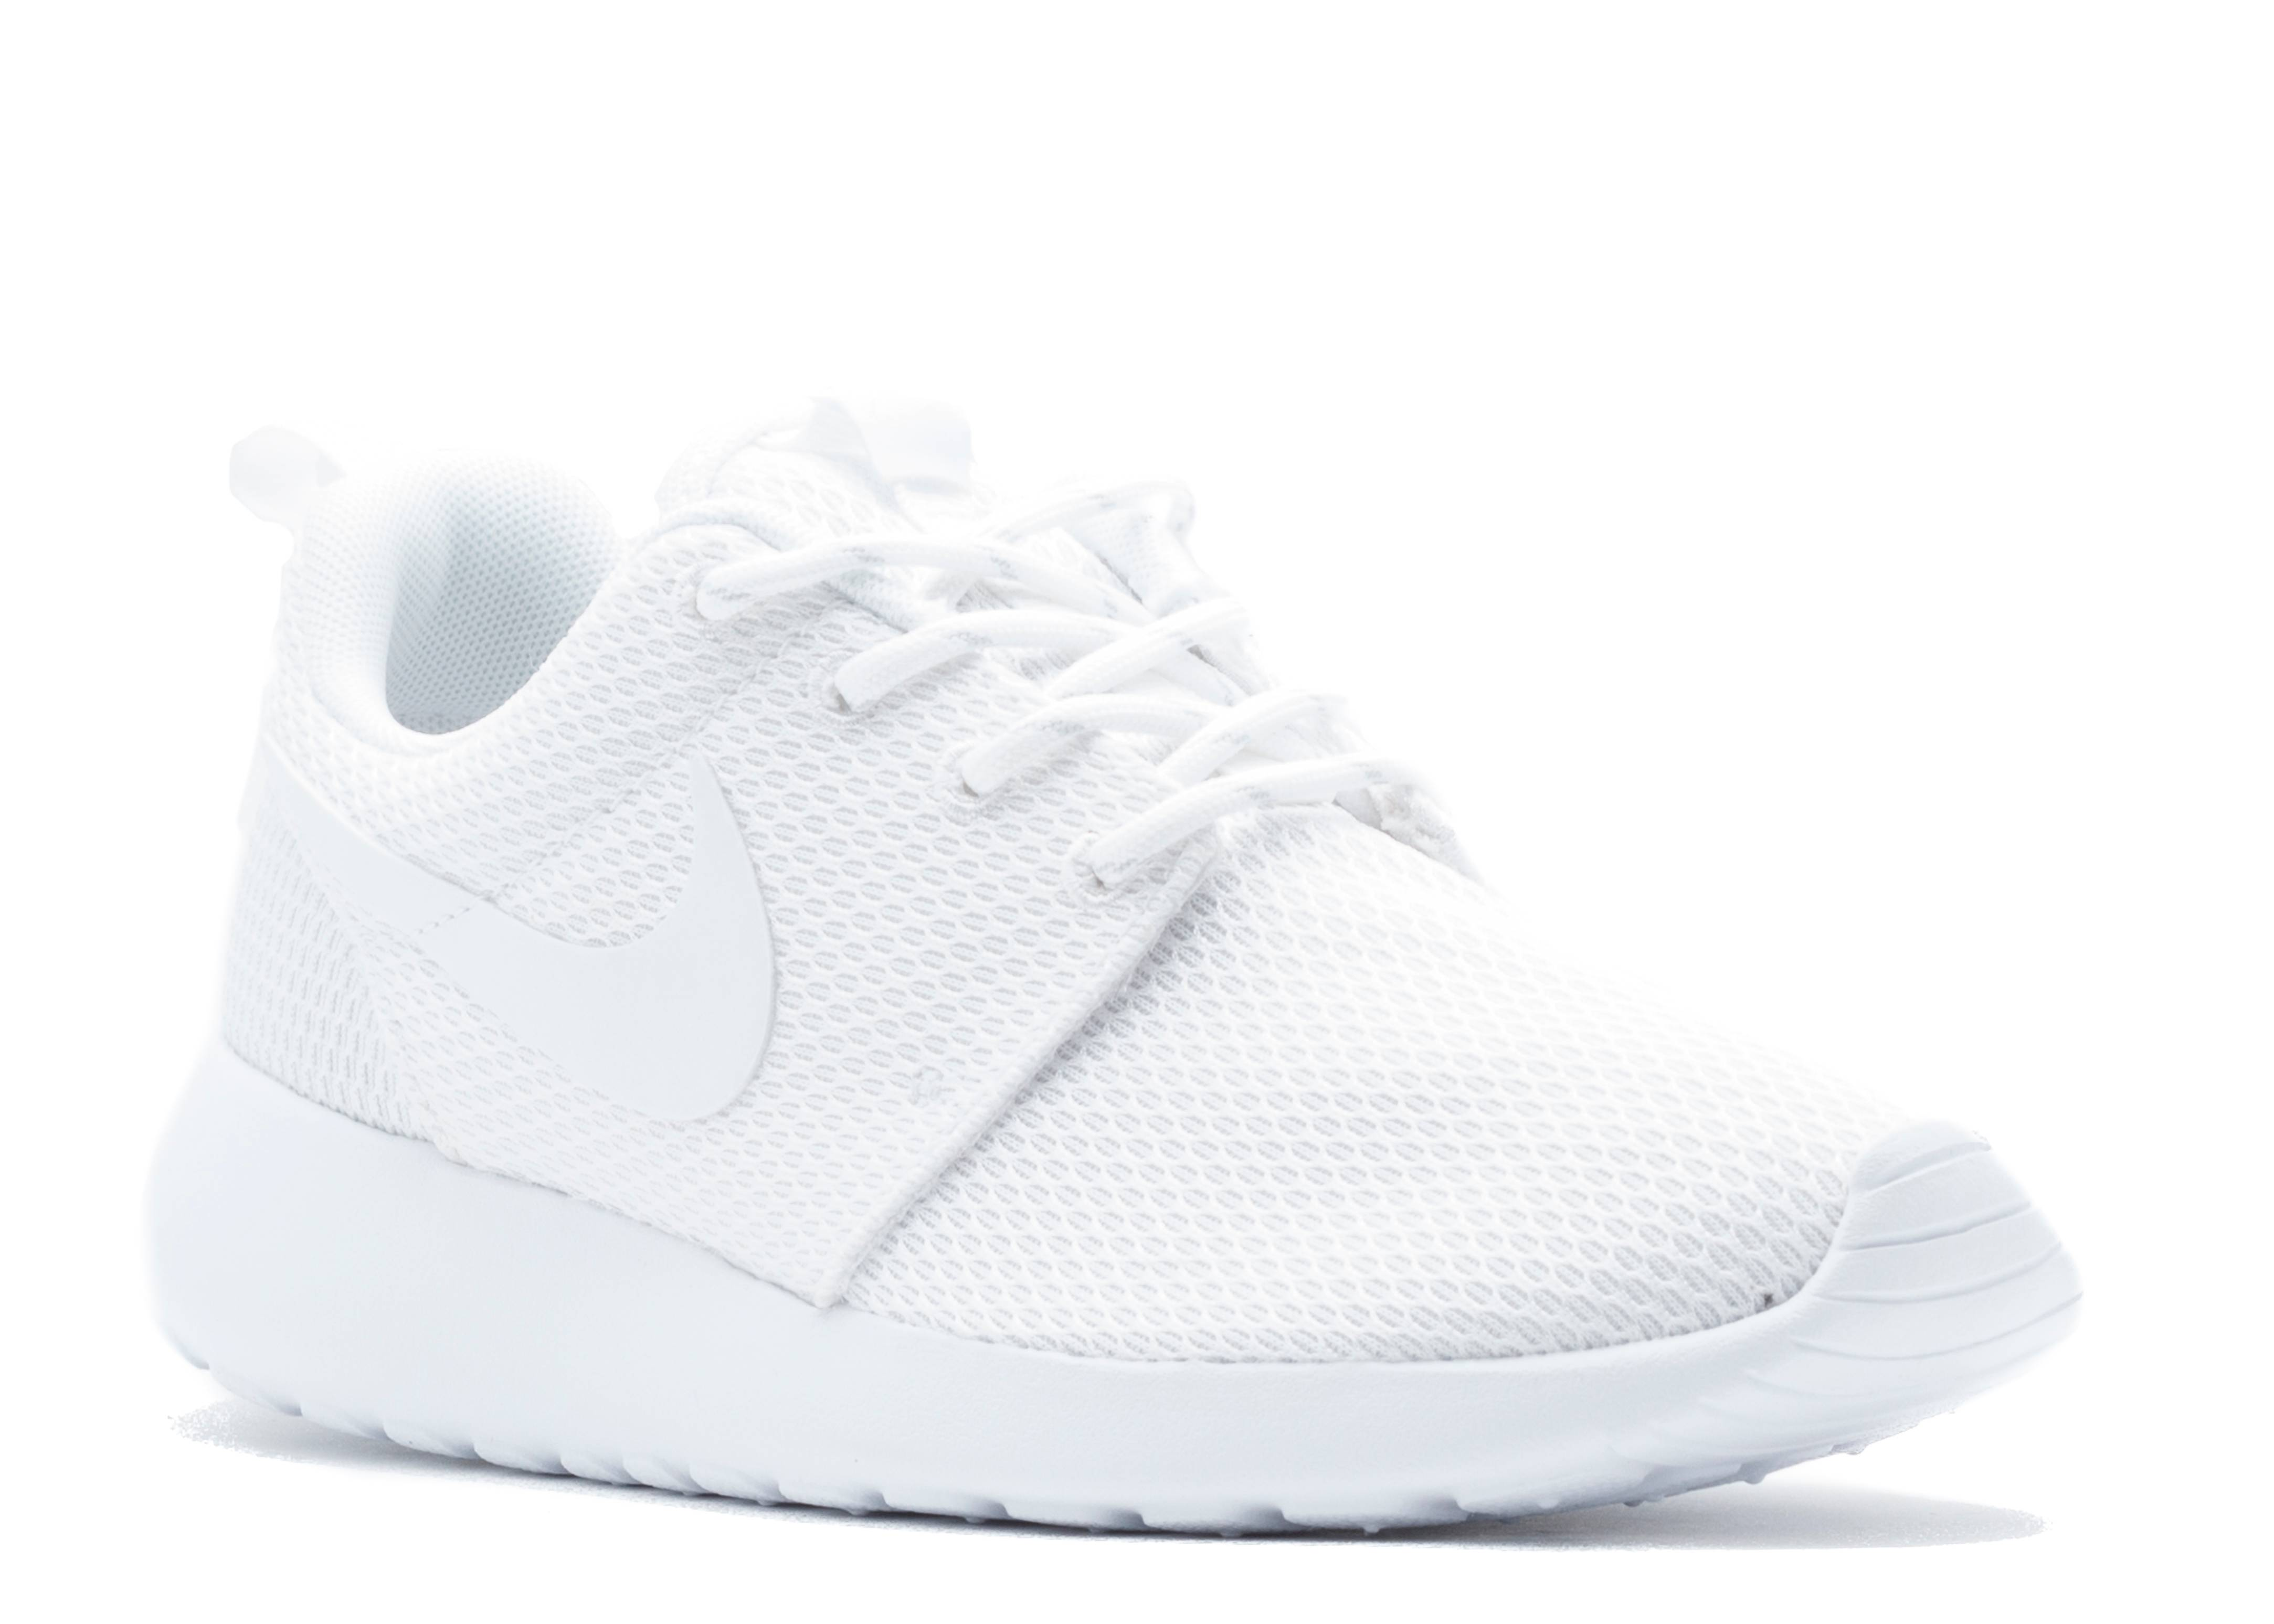 presenting 50% price exclusive range W's Roshe One - Nike - 511882 111 - white/white | Flight Club